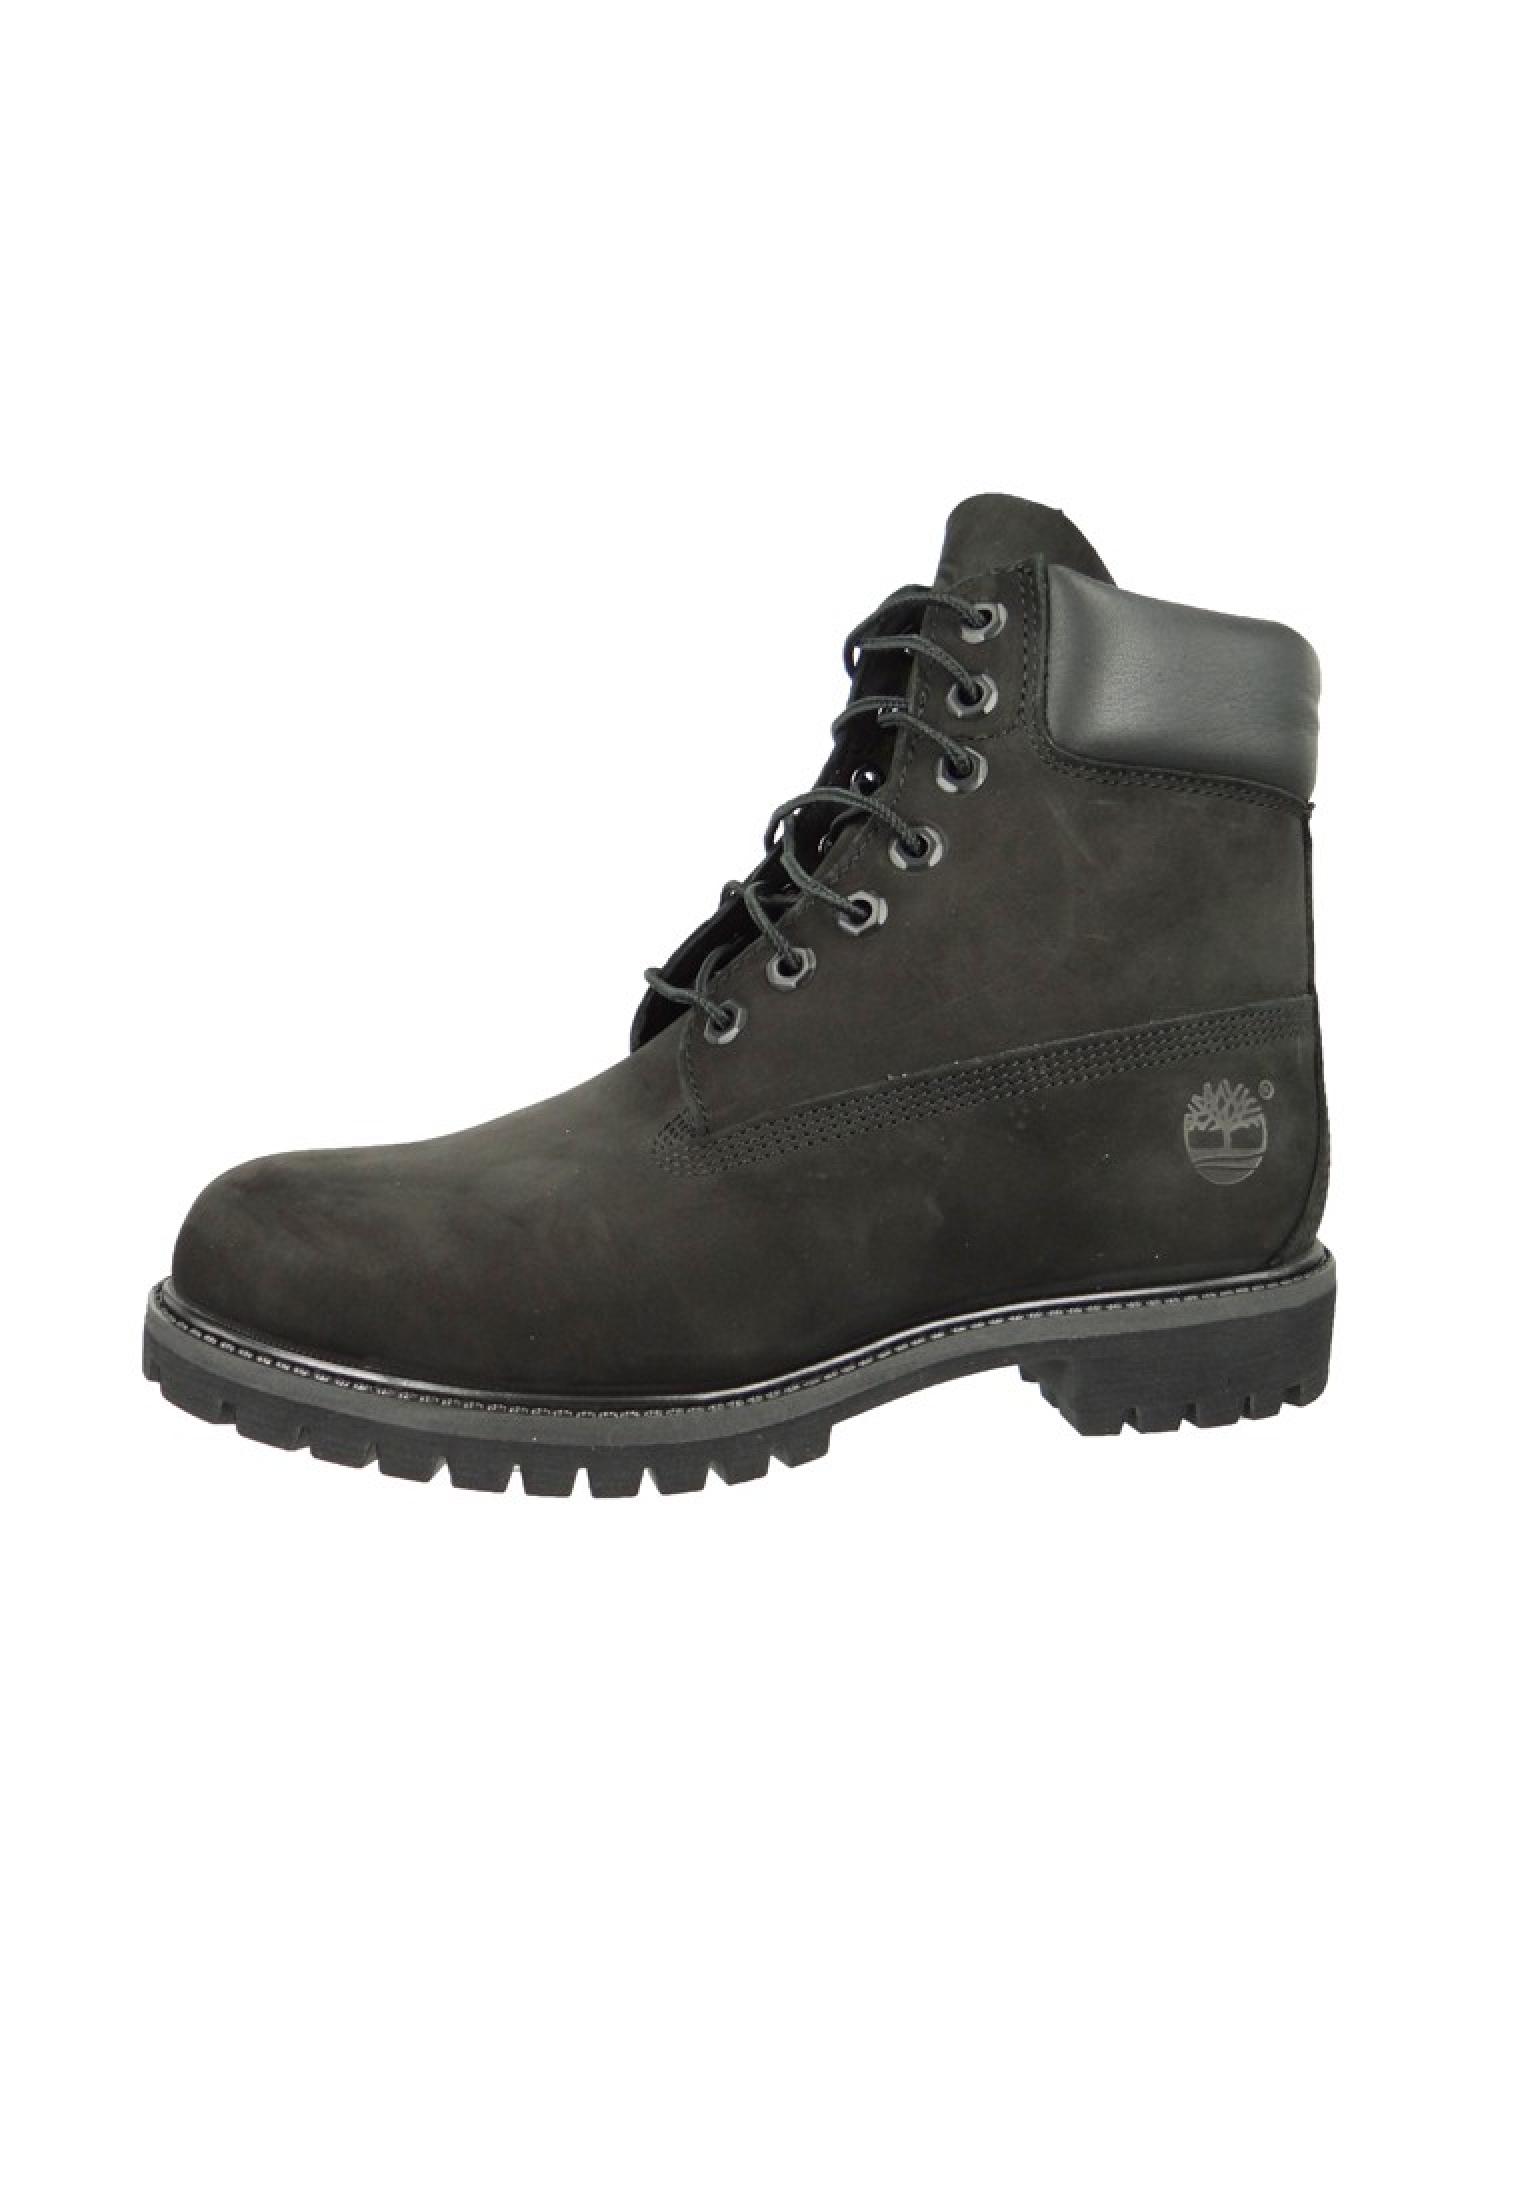 timberland herren stiefel 6 inch premium boot leder black nubuck schwarz 10073 herrenschuhe. Black Bedroom Furniture Sets. Home Design Ideas